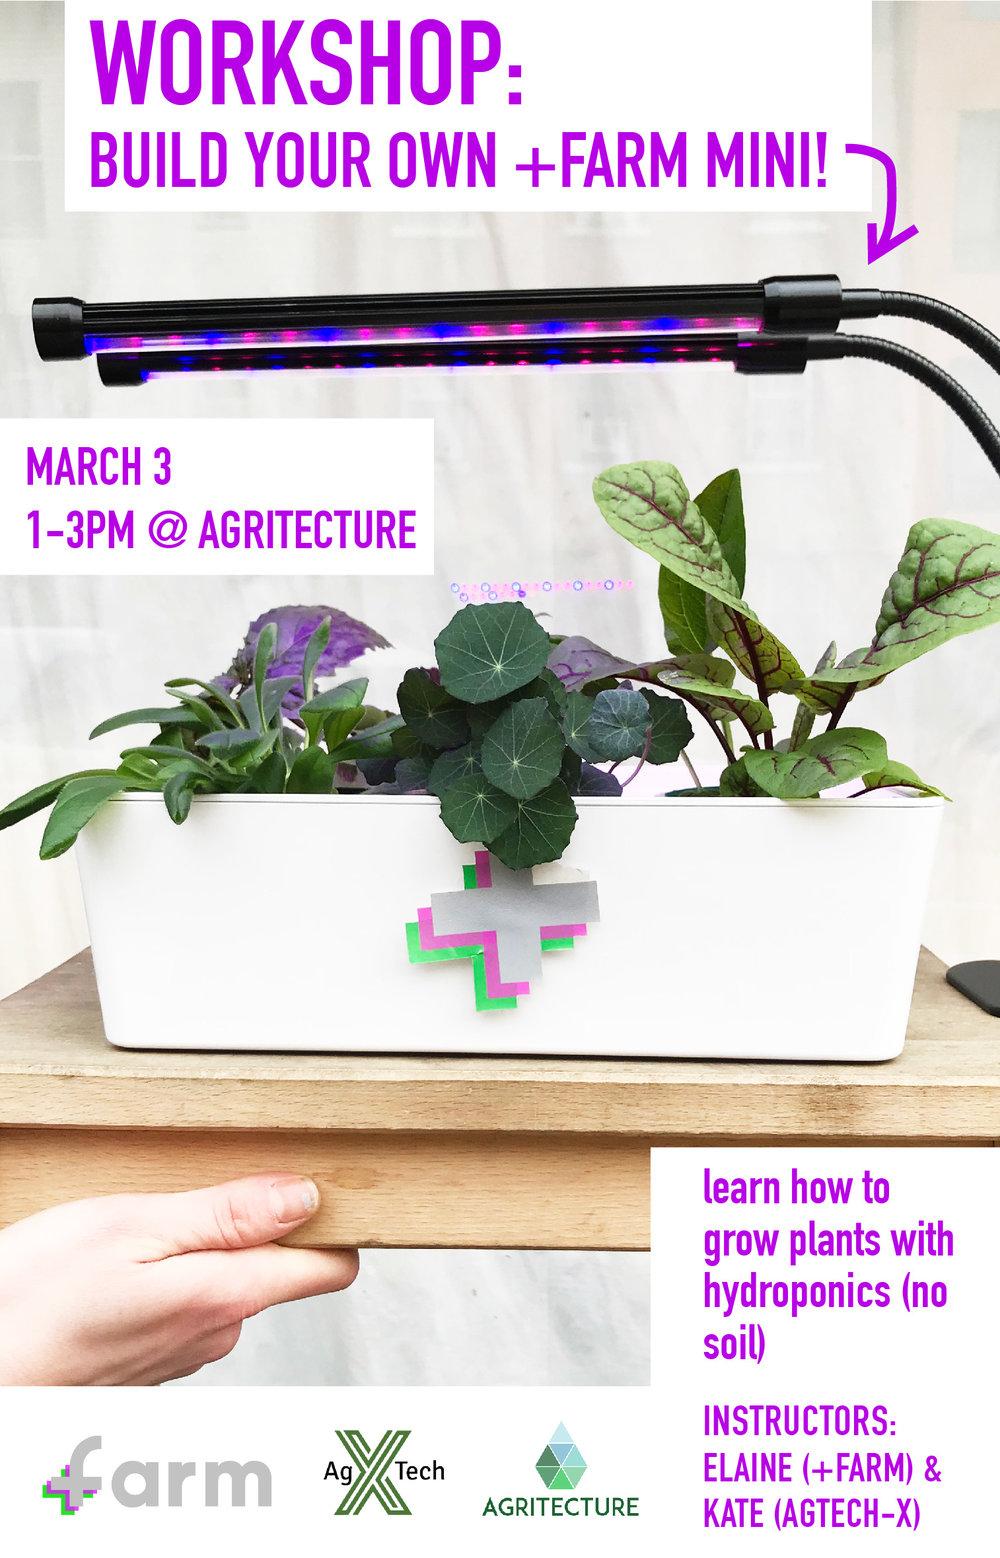 +farm workshop flyer vertical.jpg